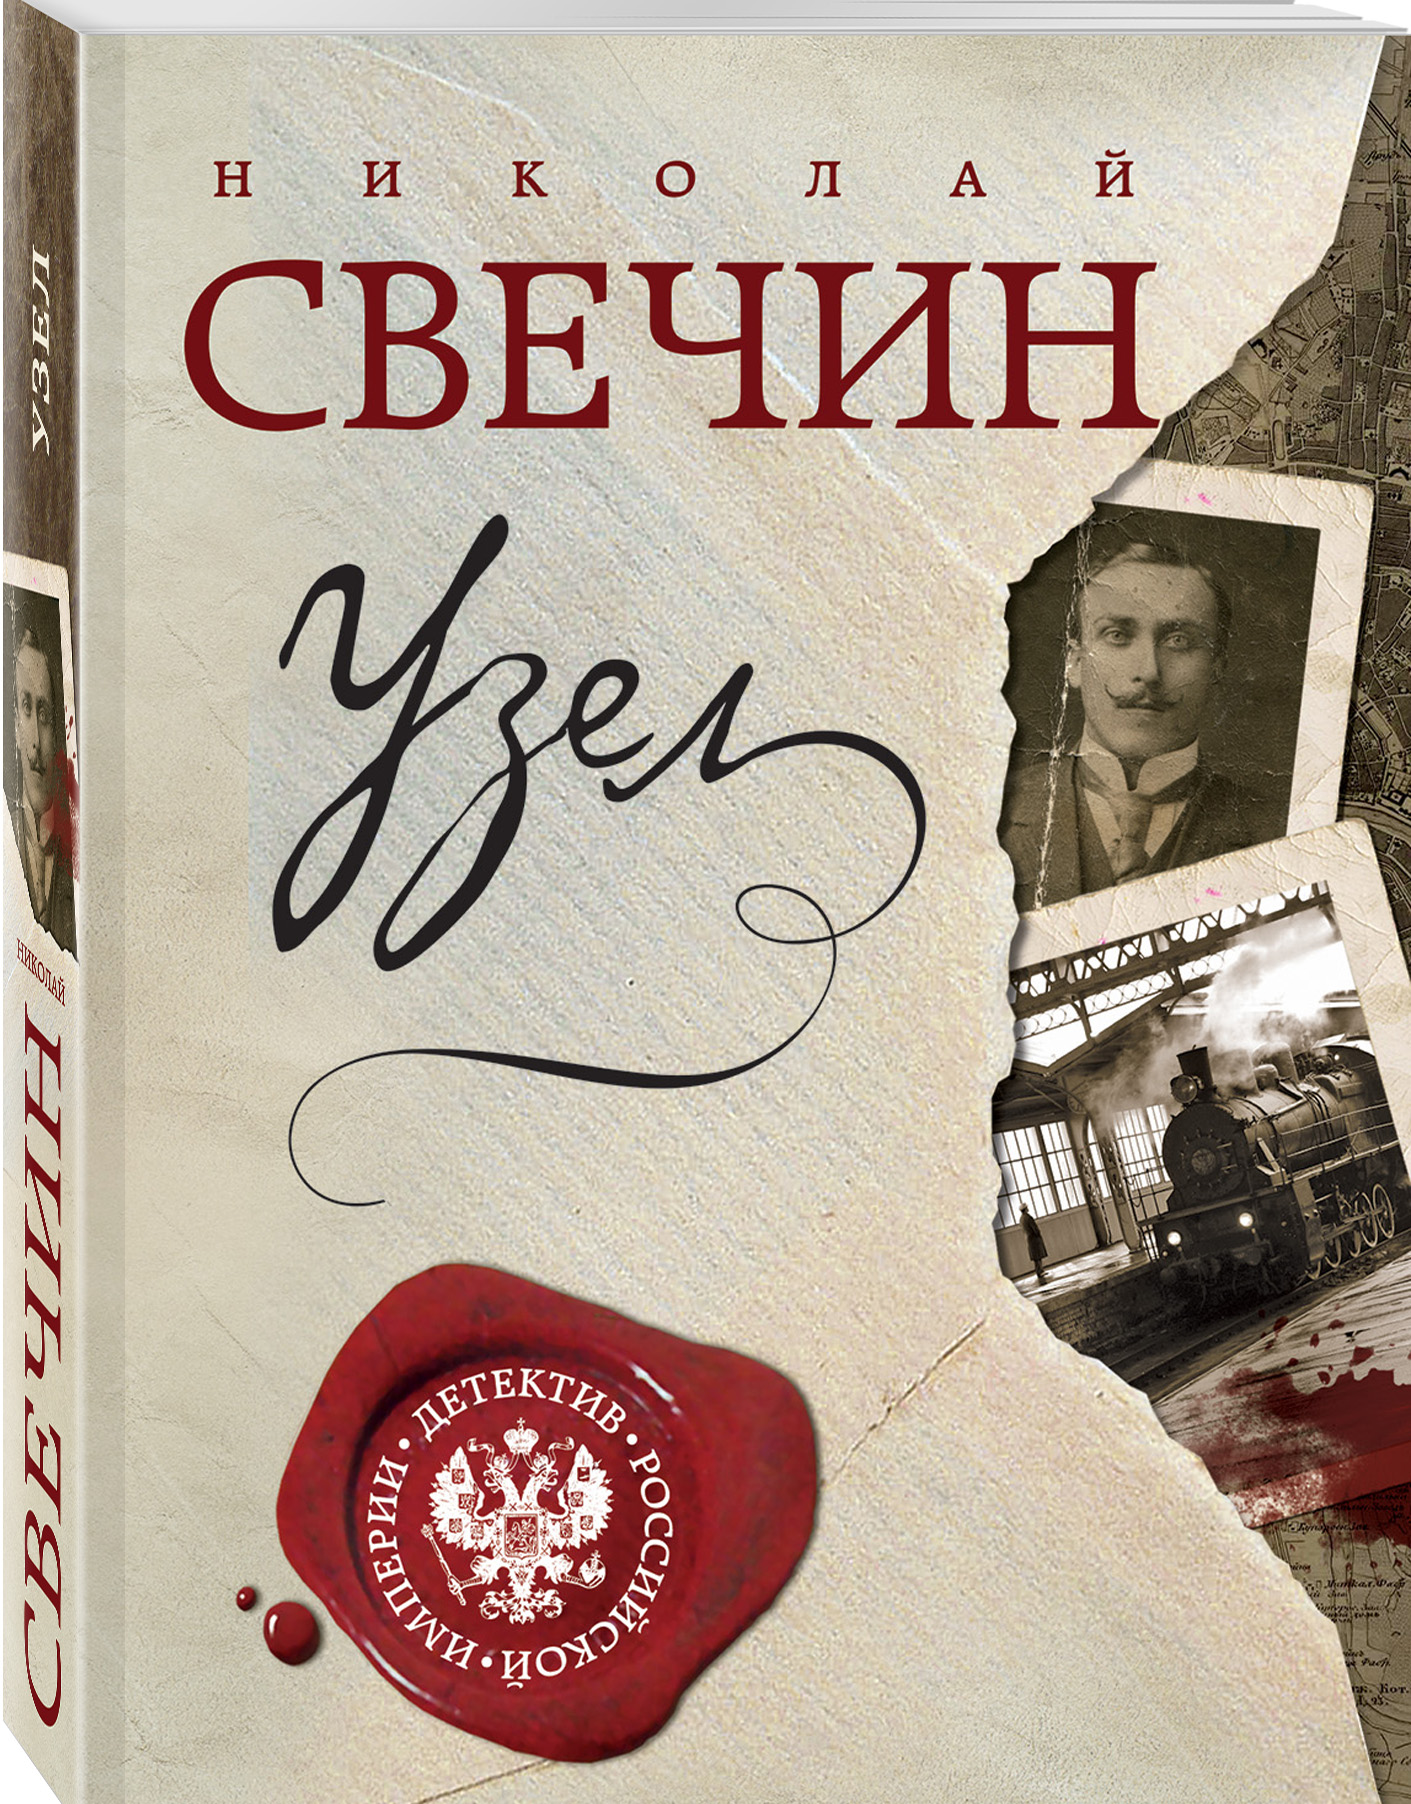 Николай Свечин Узел